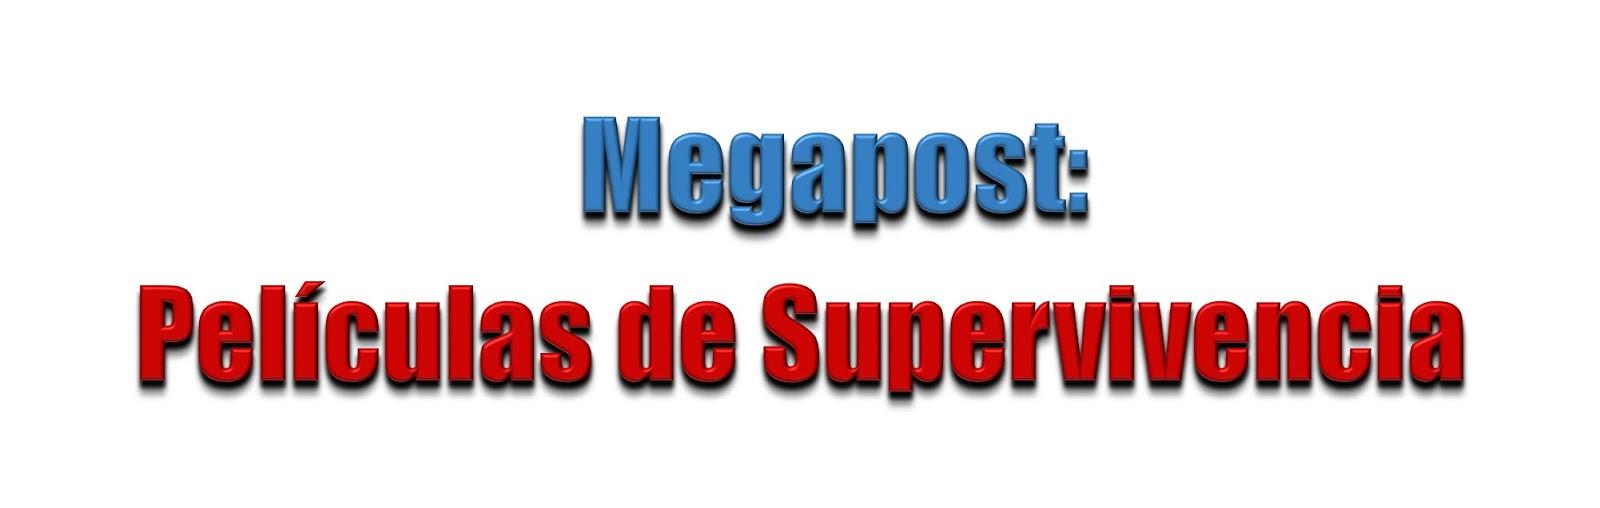 Megapost Películas de Supervivencia y Novela